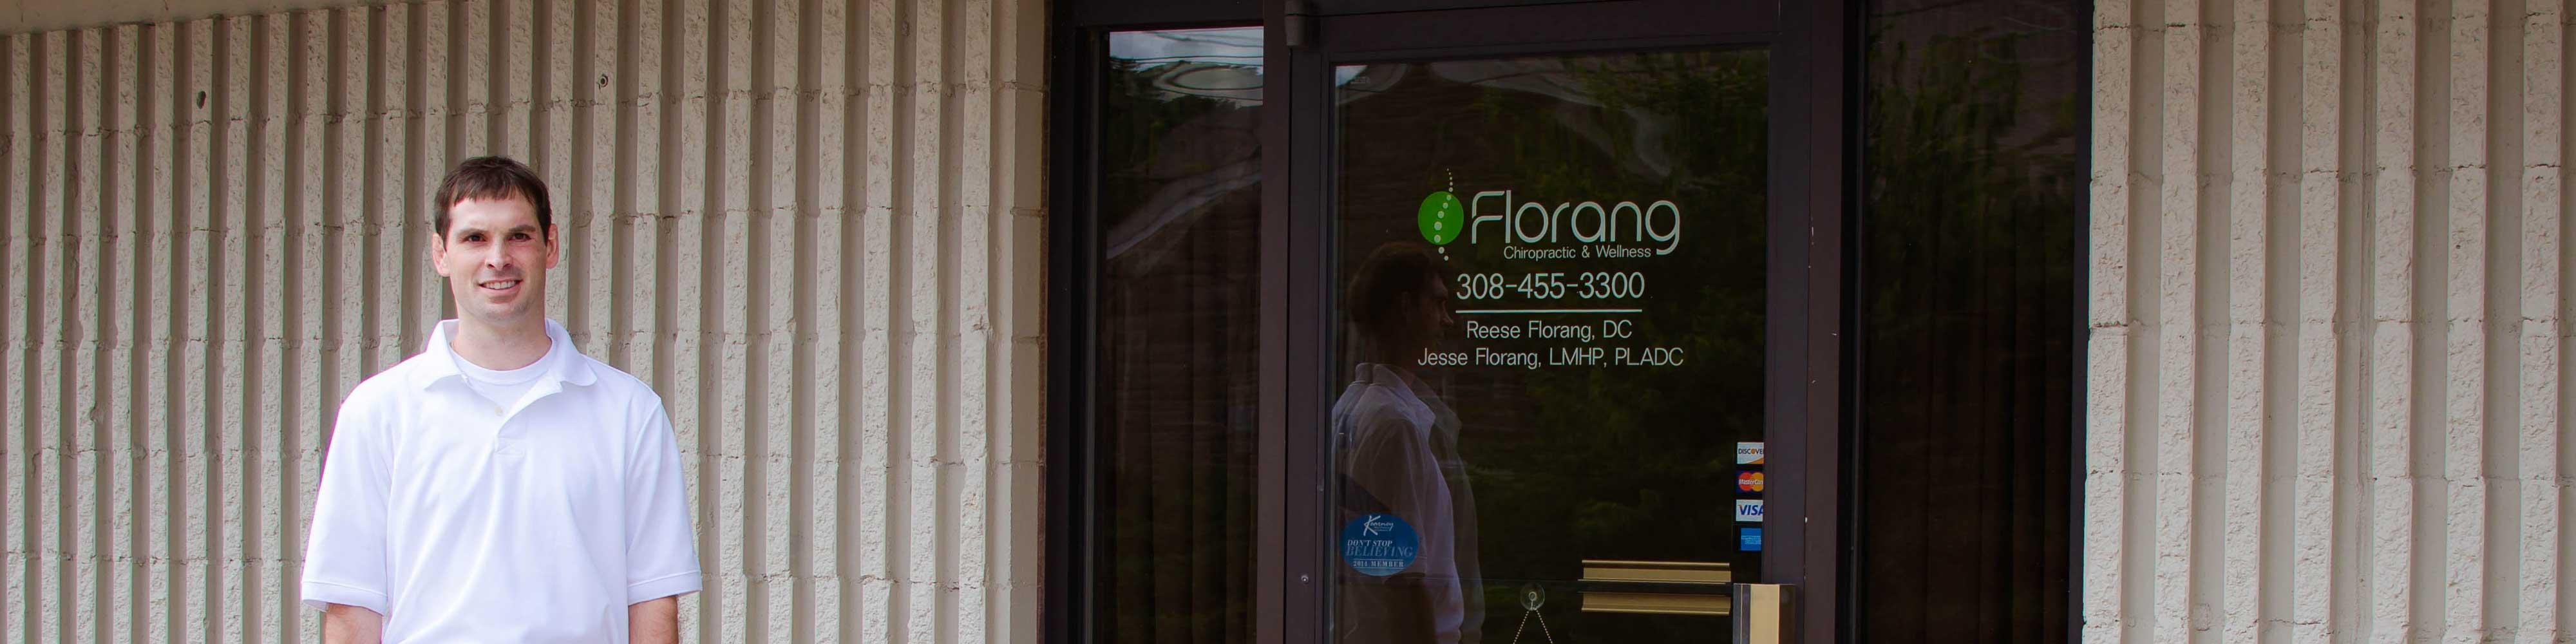 Florang Chiropractic Building Front